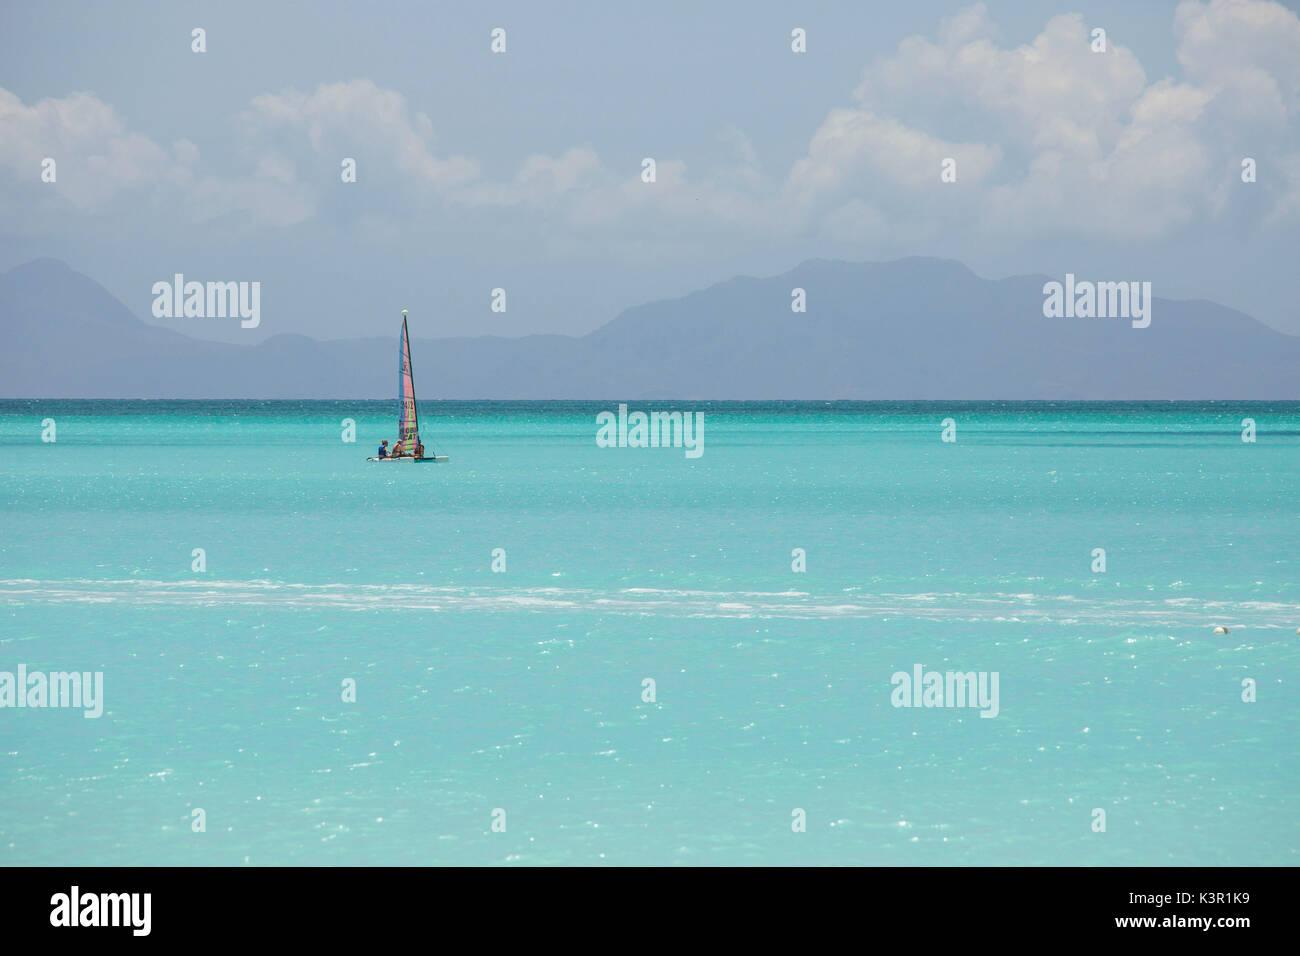 A catamaran in the crystalline waters of the Caribbean Sea Jolly Beach Antigua and Barbuda Leeward Island West Indies - Stock Image